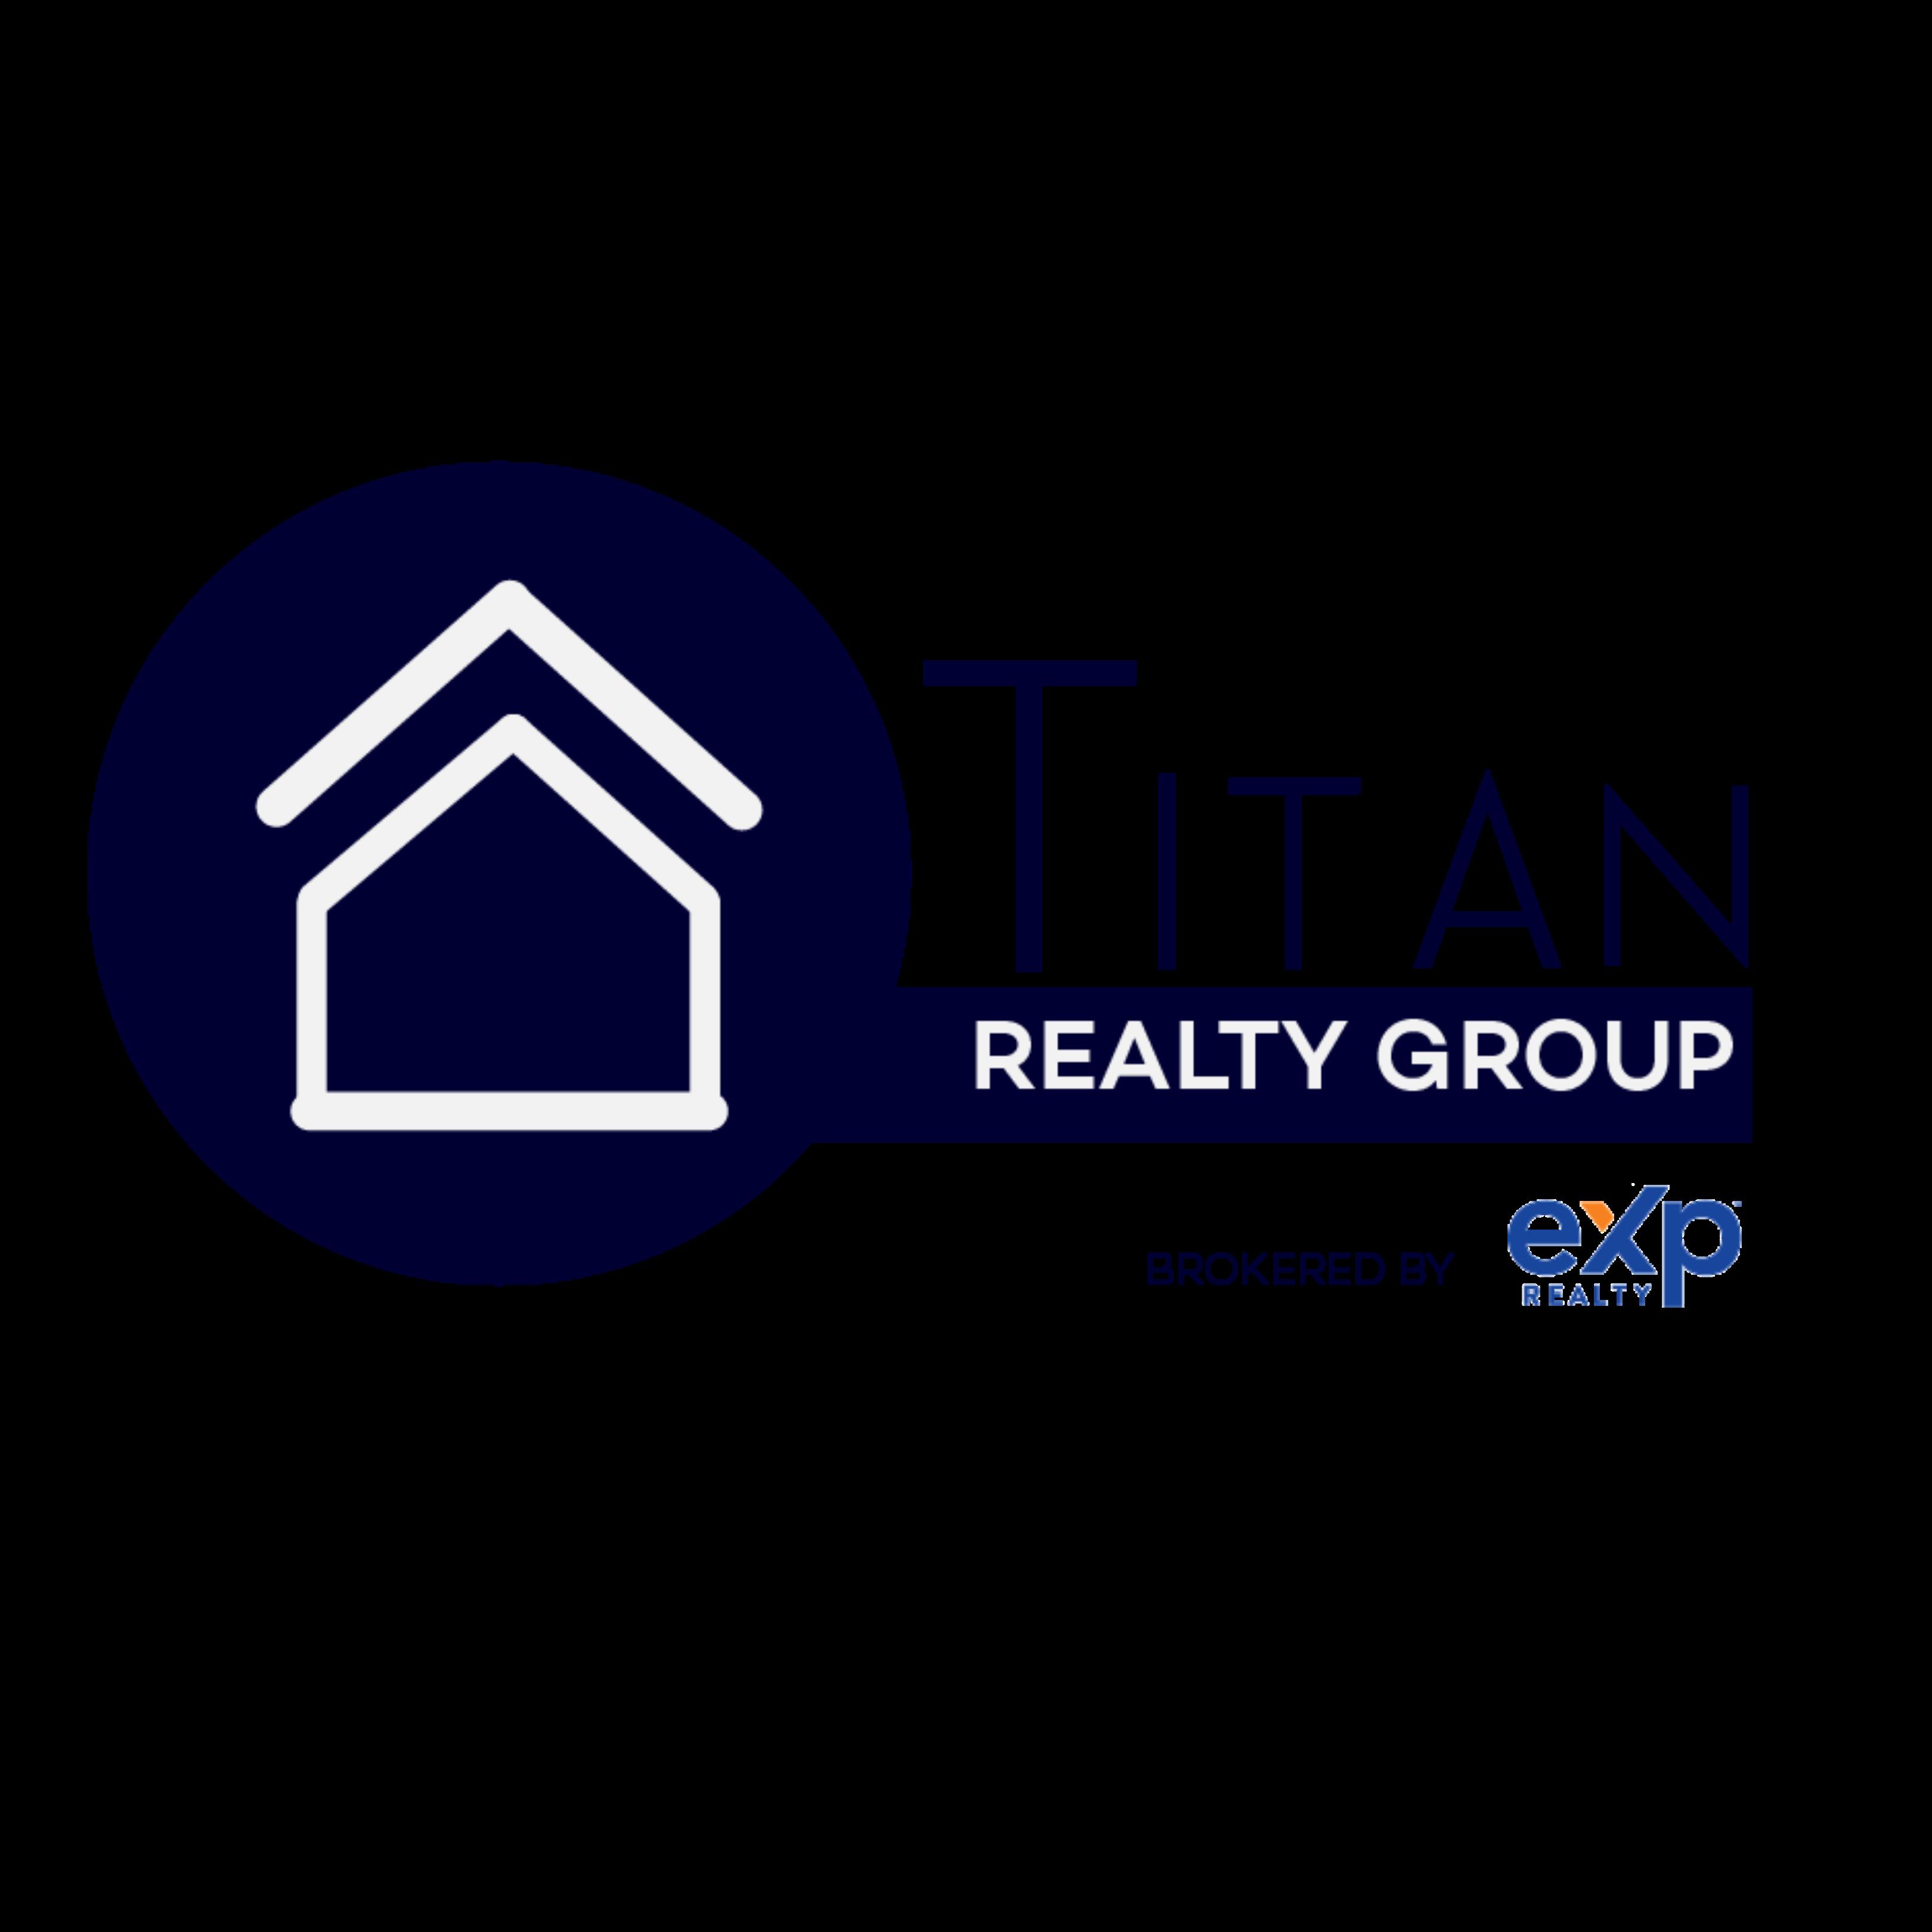 TITAN Realty Group